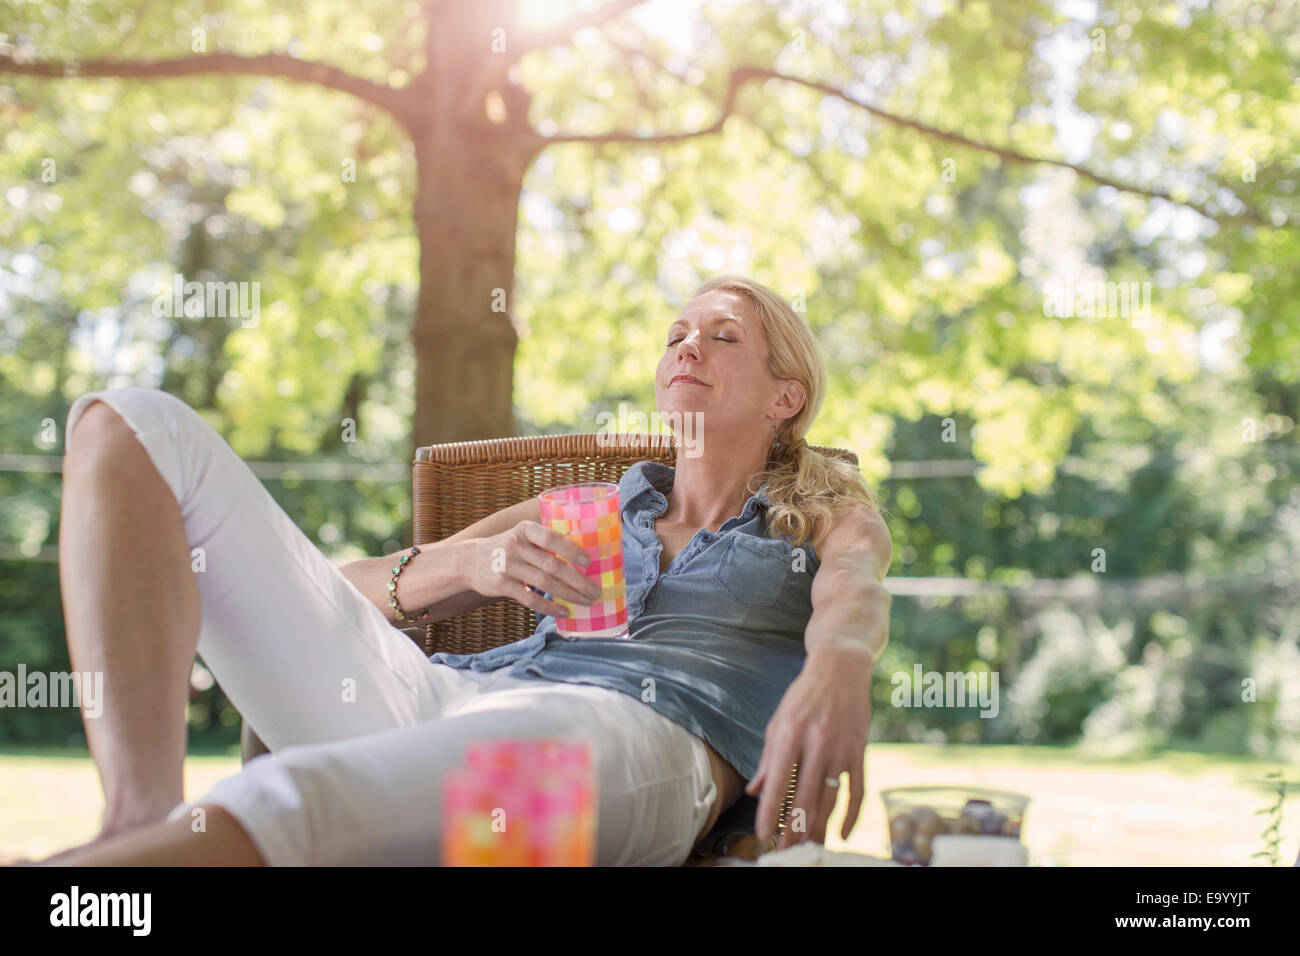 Mature Woman relaxing in garden avec boisson Photo Stock